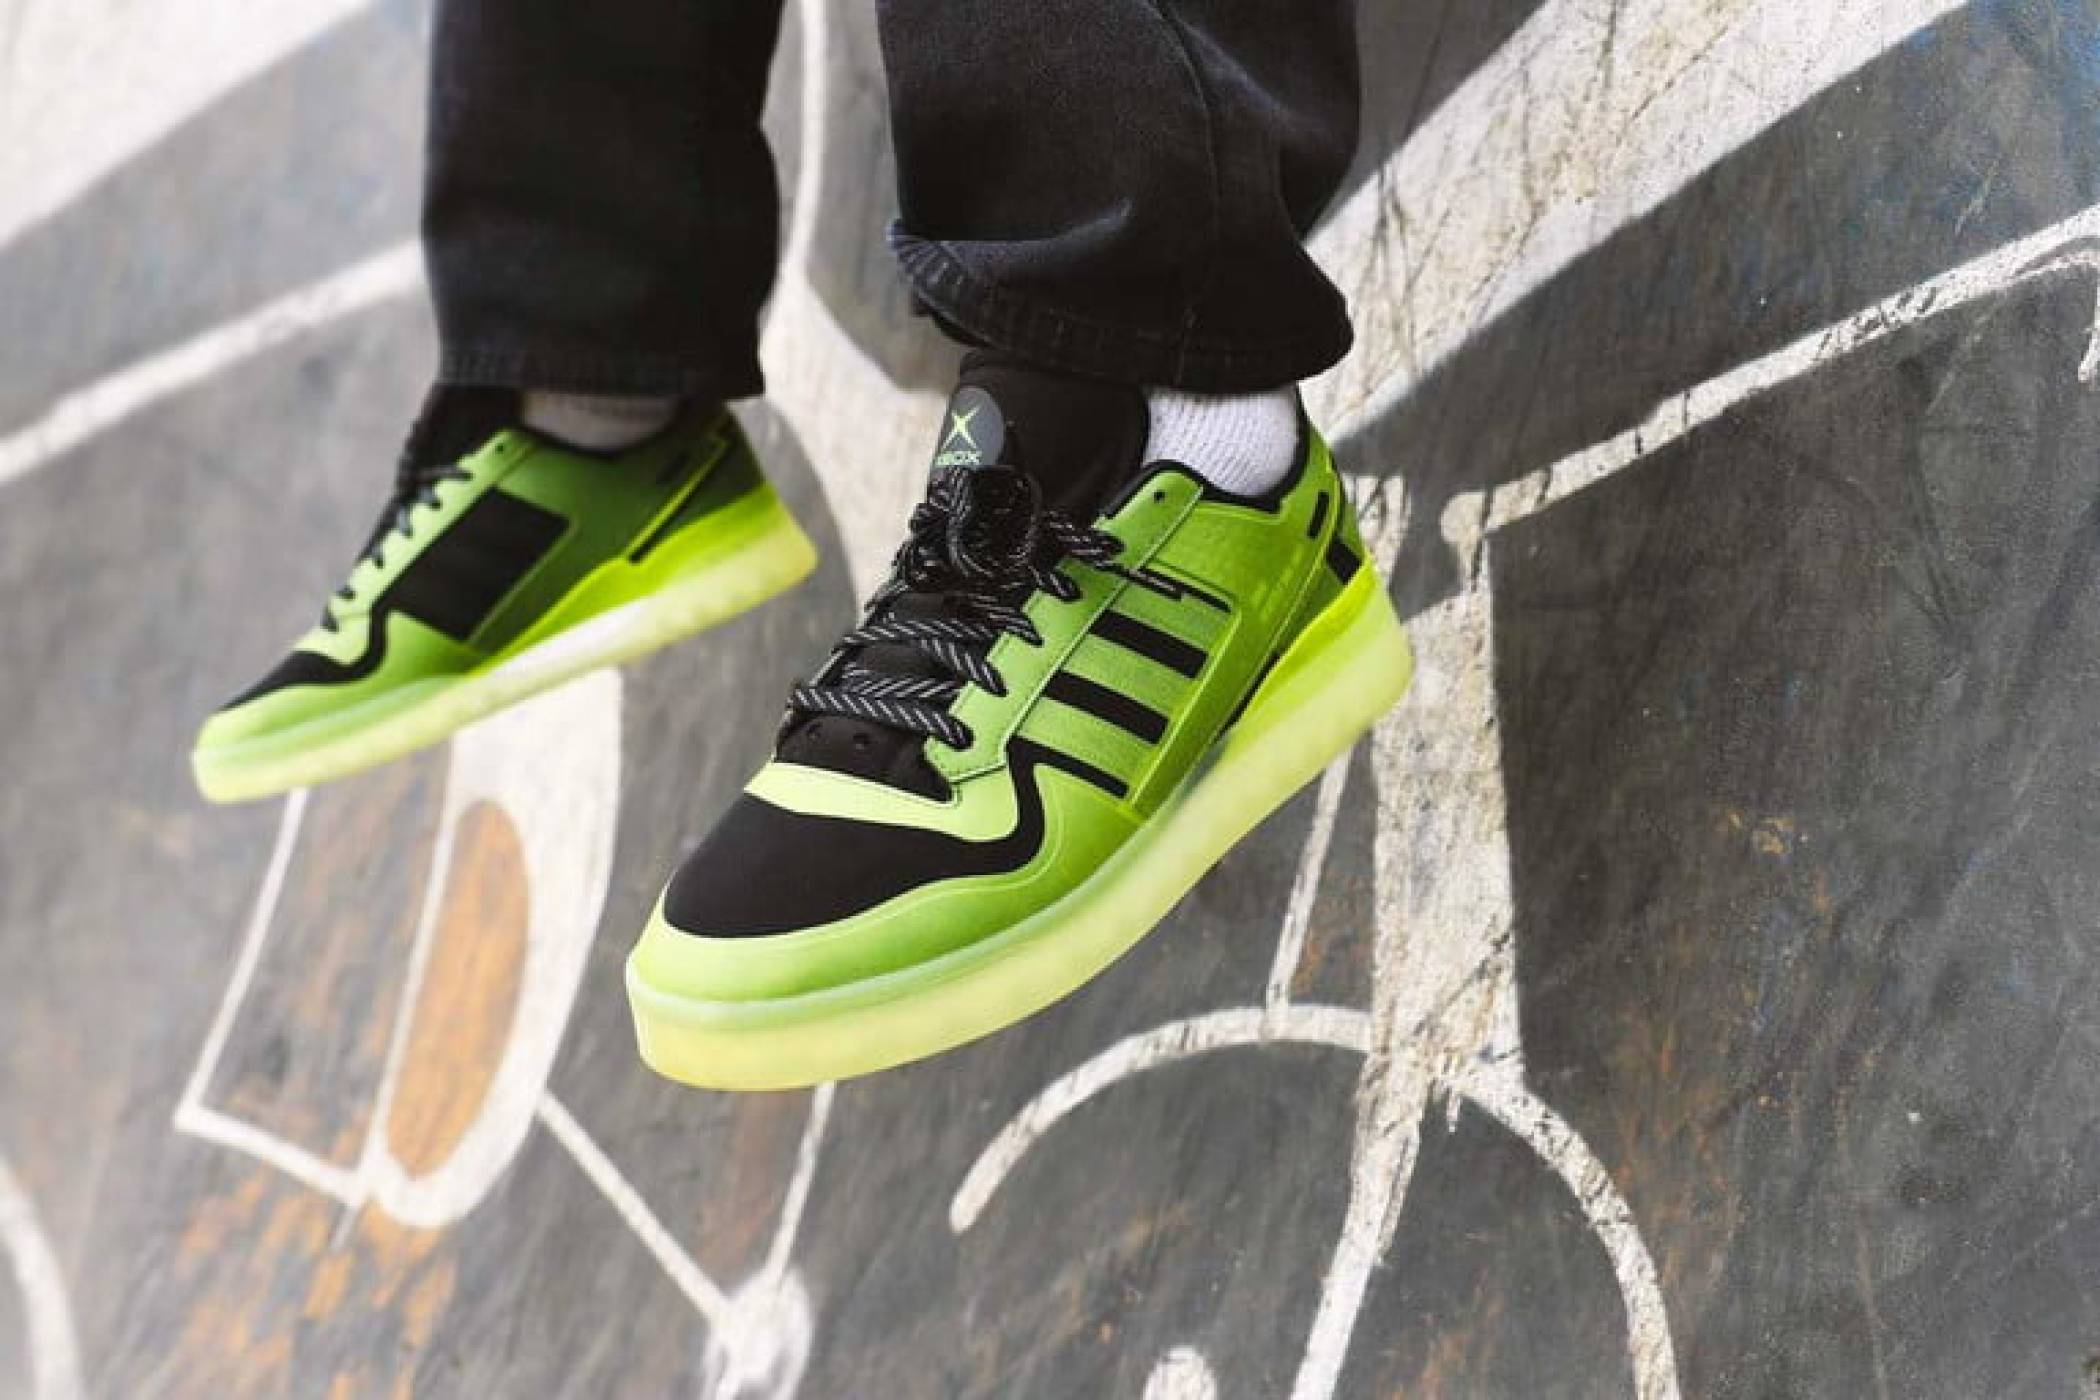 Adidas залагат на Xbox  (ВИДЕО)